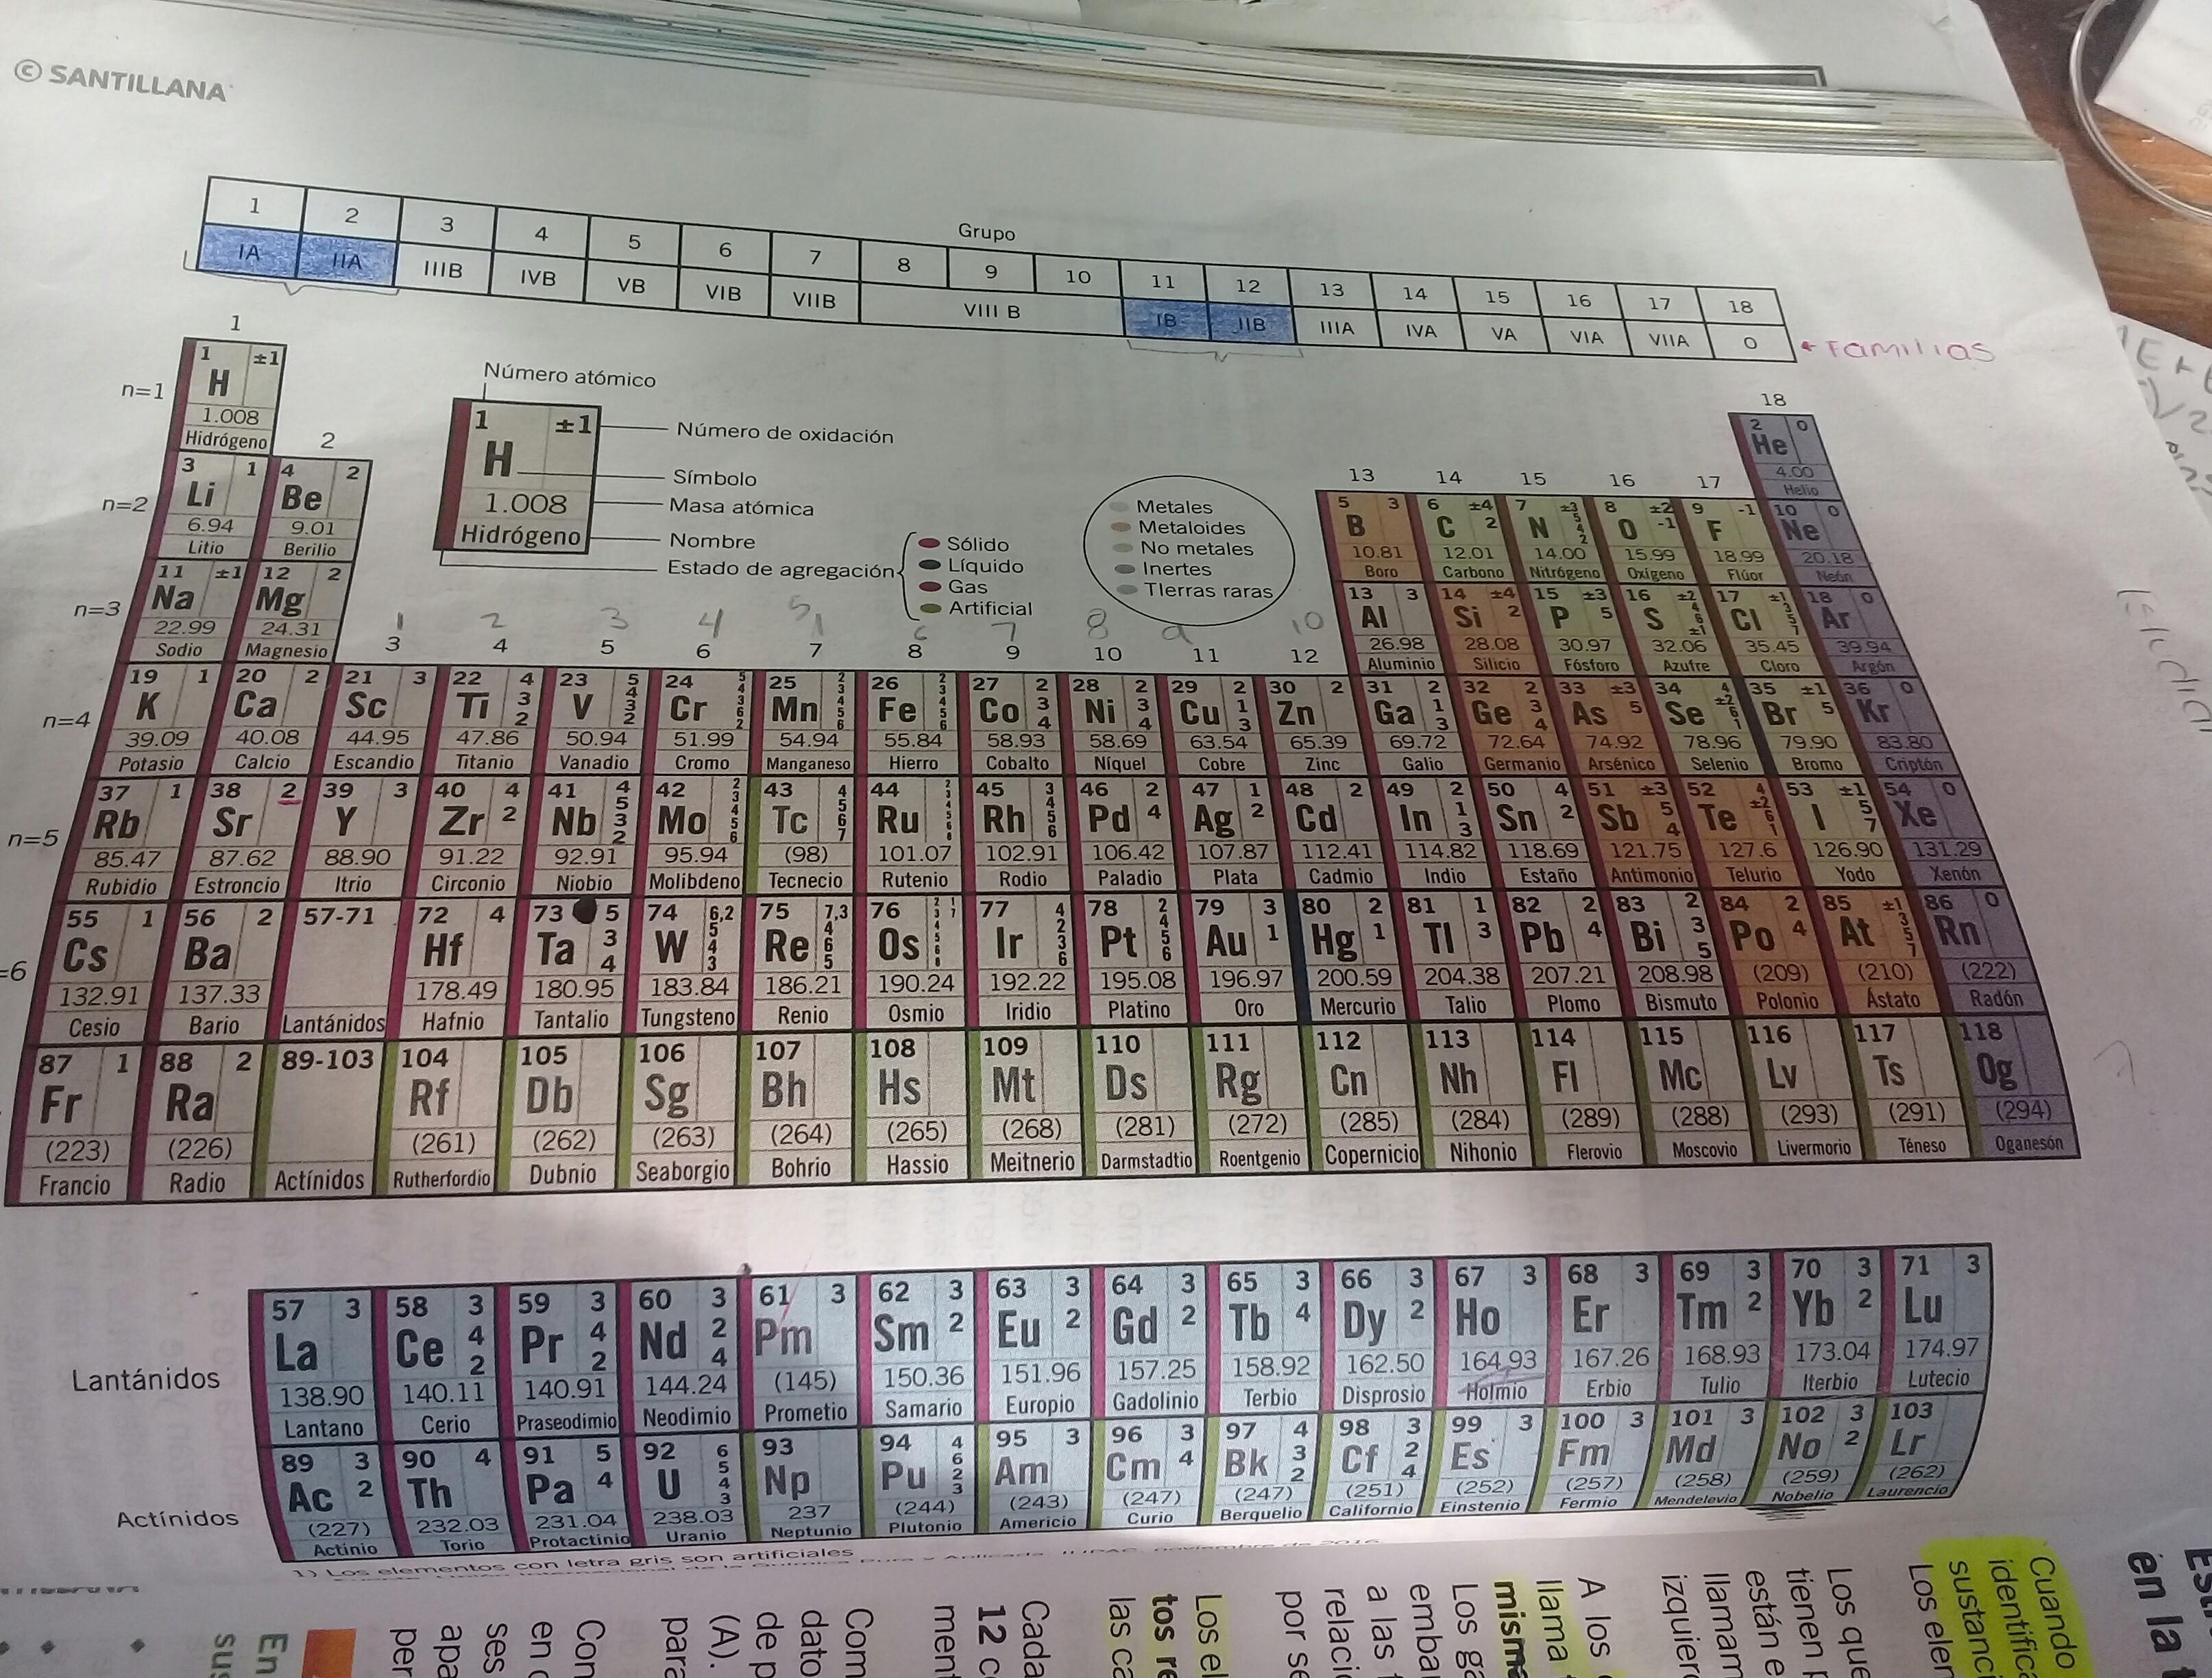 Tabla periodica electrones de valencia muchas gracias brainlyt descarga jpg urtaz Choice Image